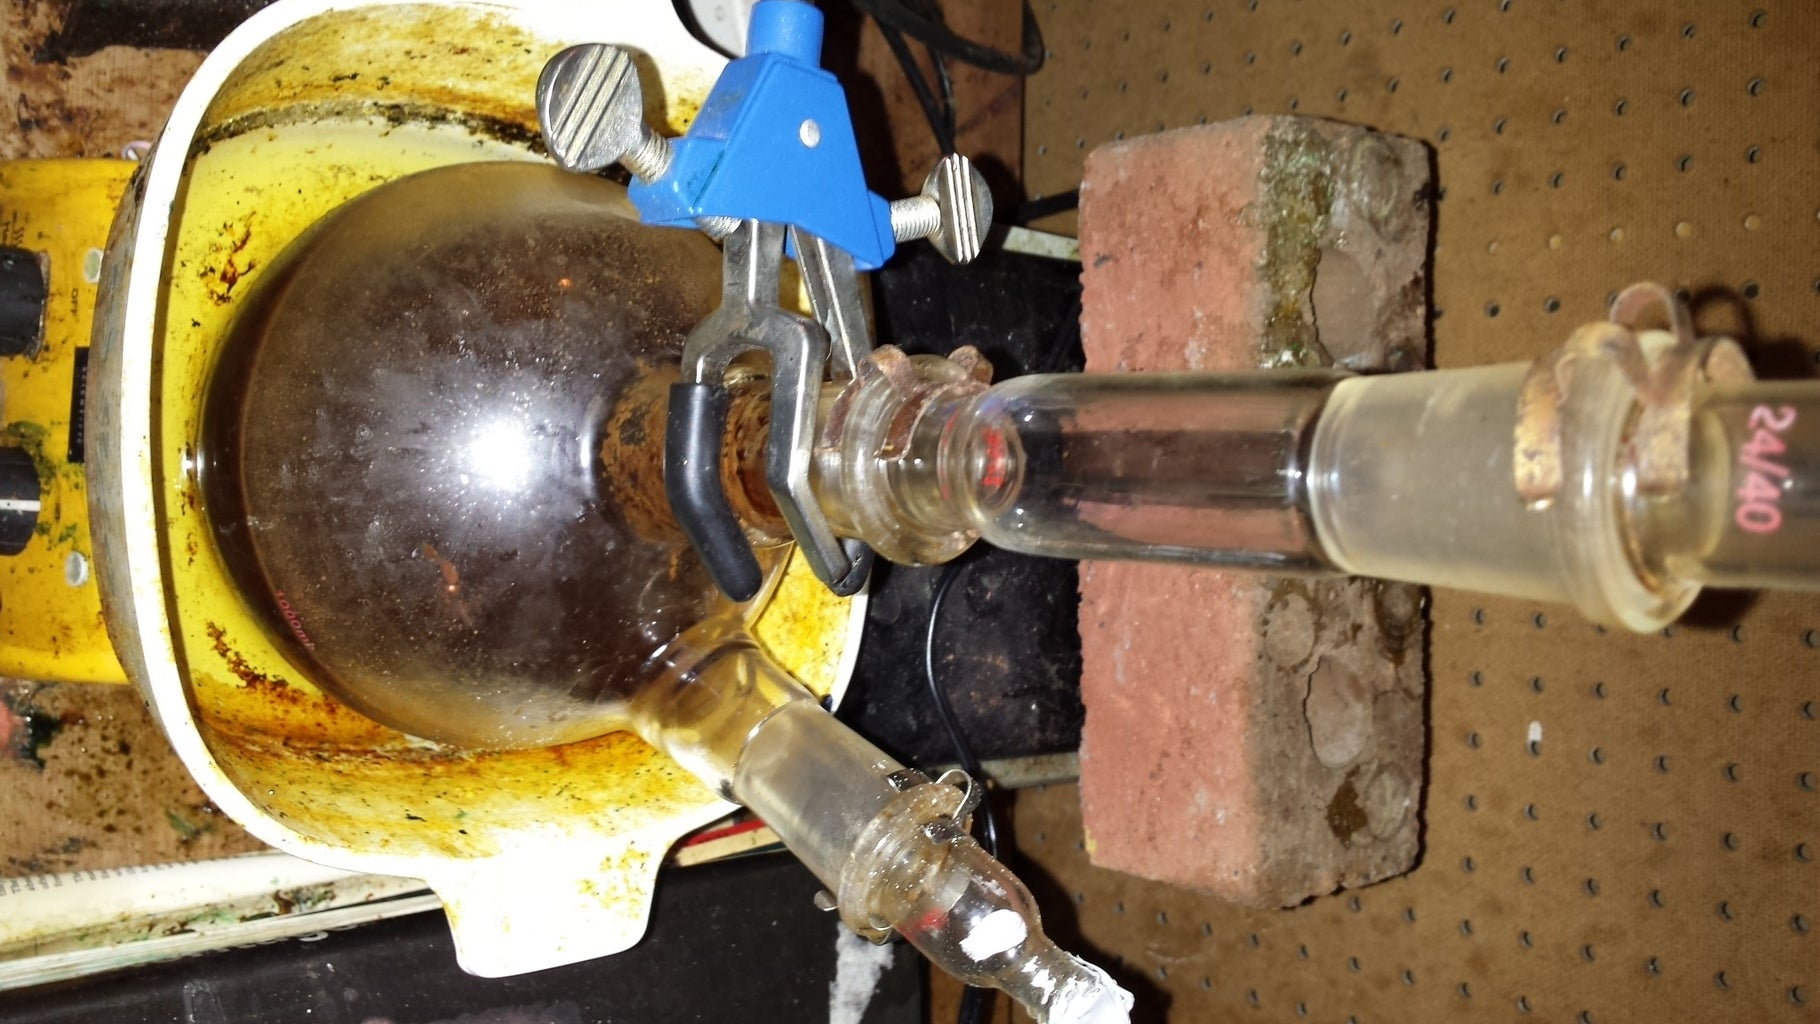 Preparing the Distillation of Certain Materials. Part 1